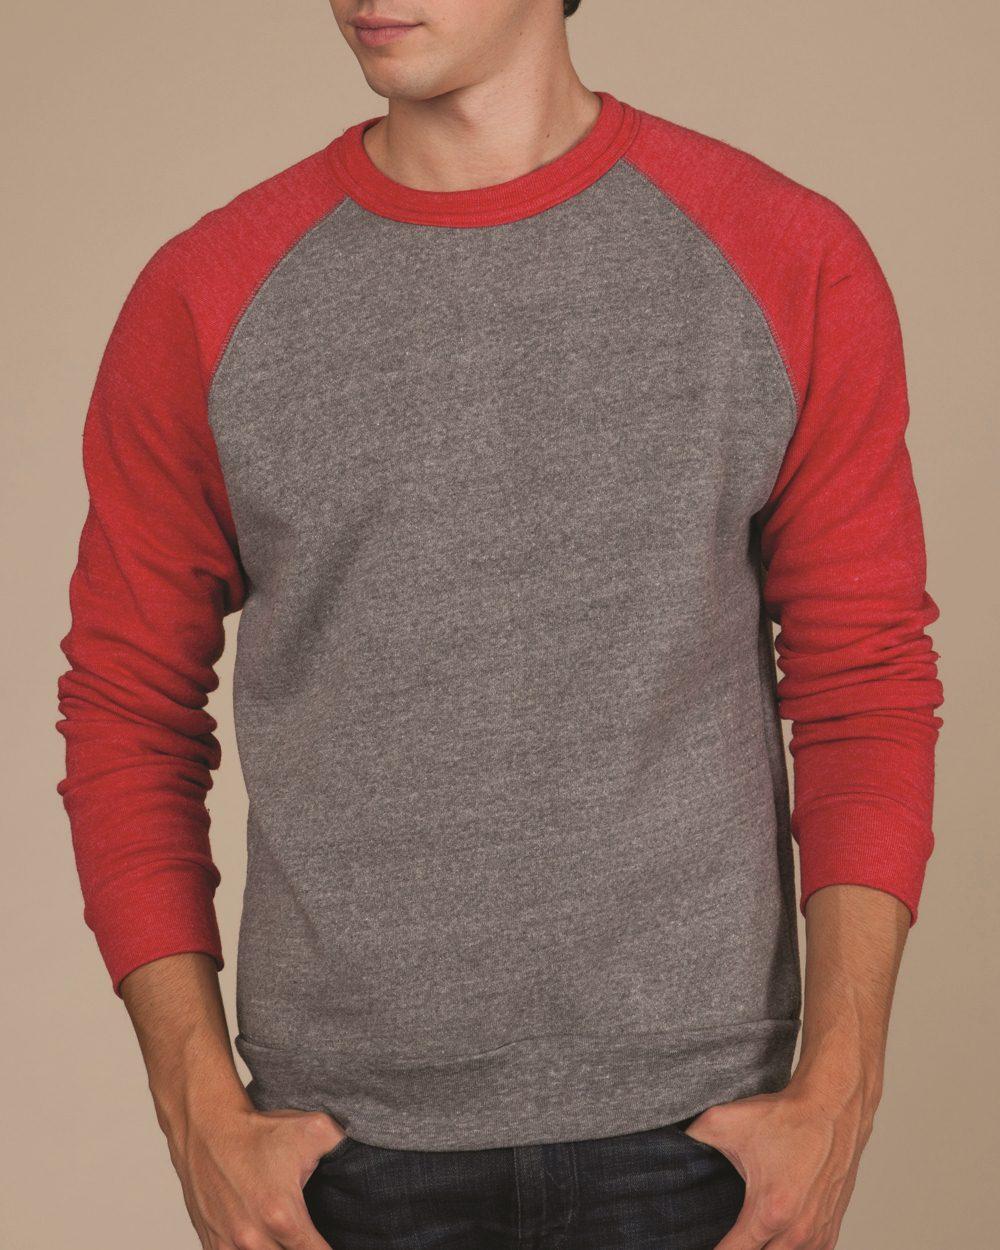 573e34528a501 Alternative 32022 - The Champ Unisex Colorblocked Eco Fleece Crewneck  Sweatshirt